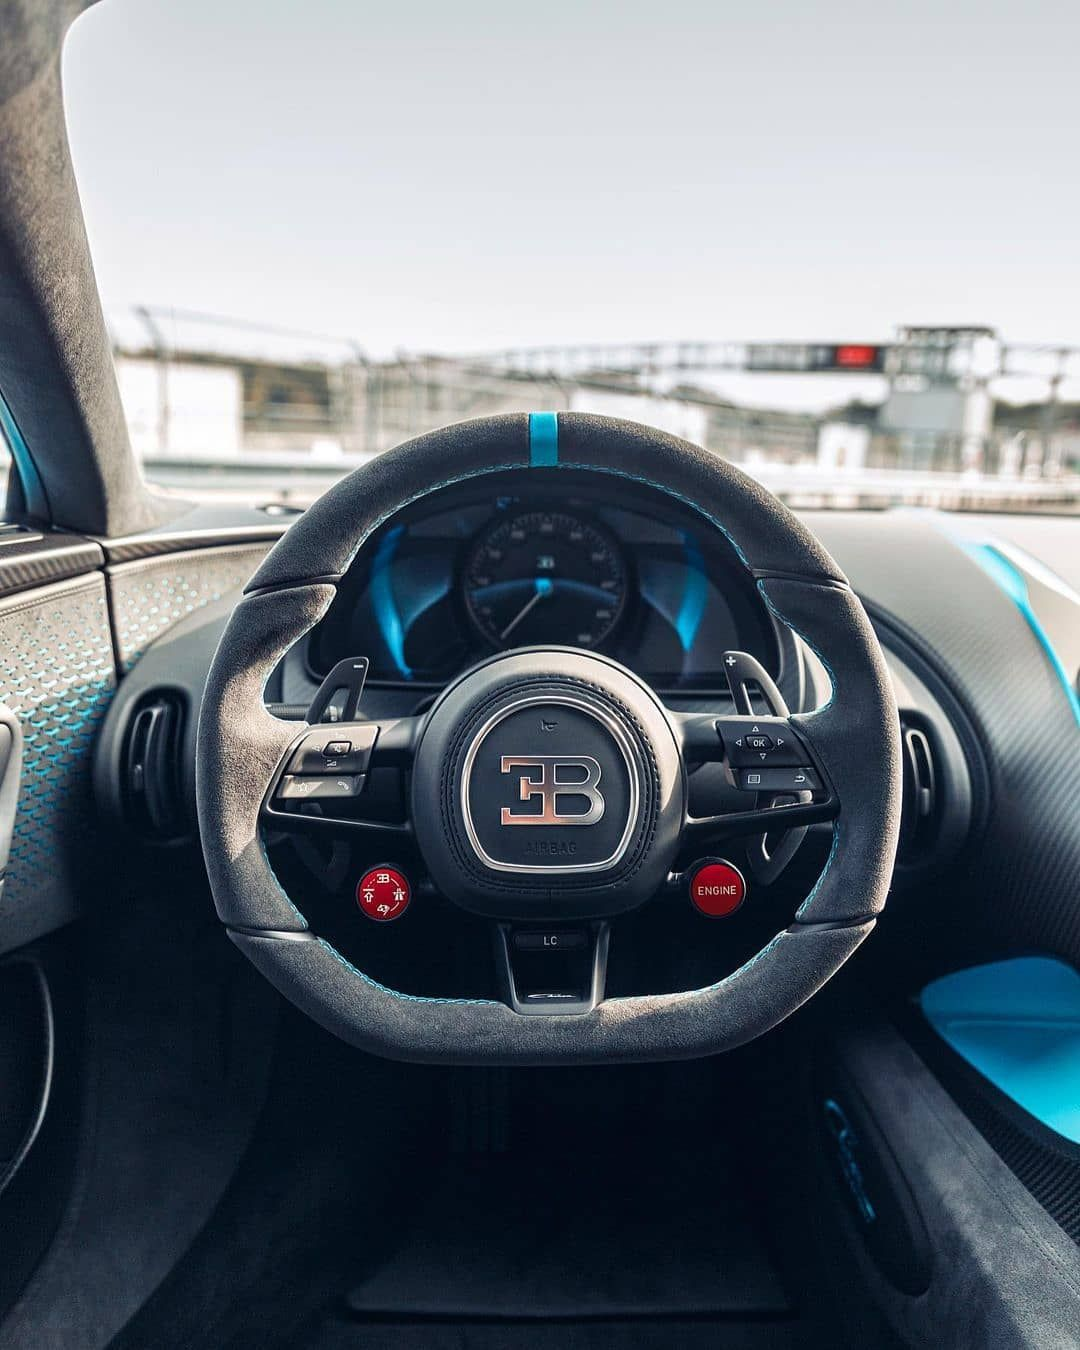 B U G A T T I On Instagram Drivers View In The Bugatti Chiron Pur Sport Photo By Kenozache Bugatti In 2021 Bugatti Chiron Bugatti Chiron Pur Sport Bugatti